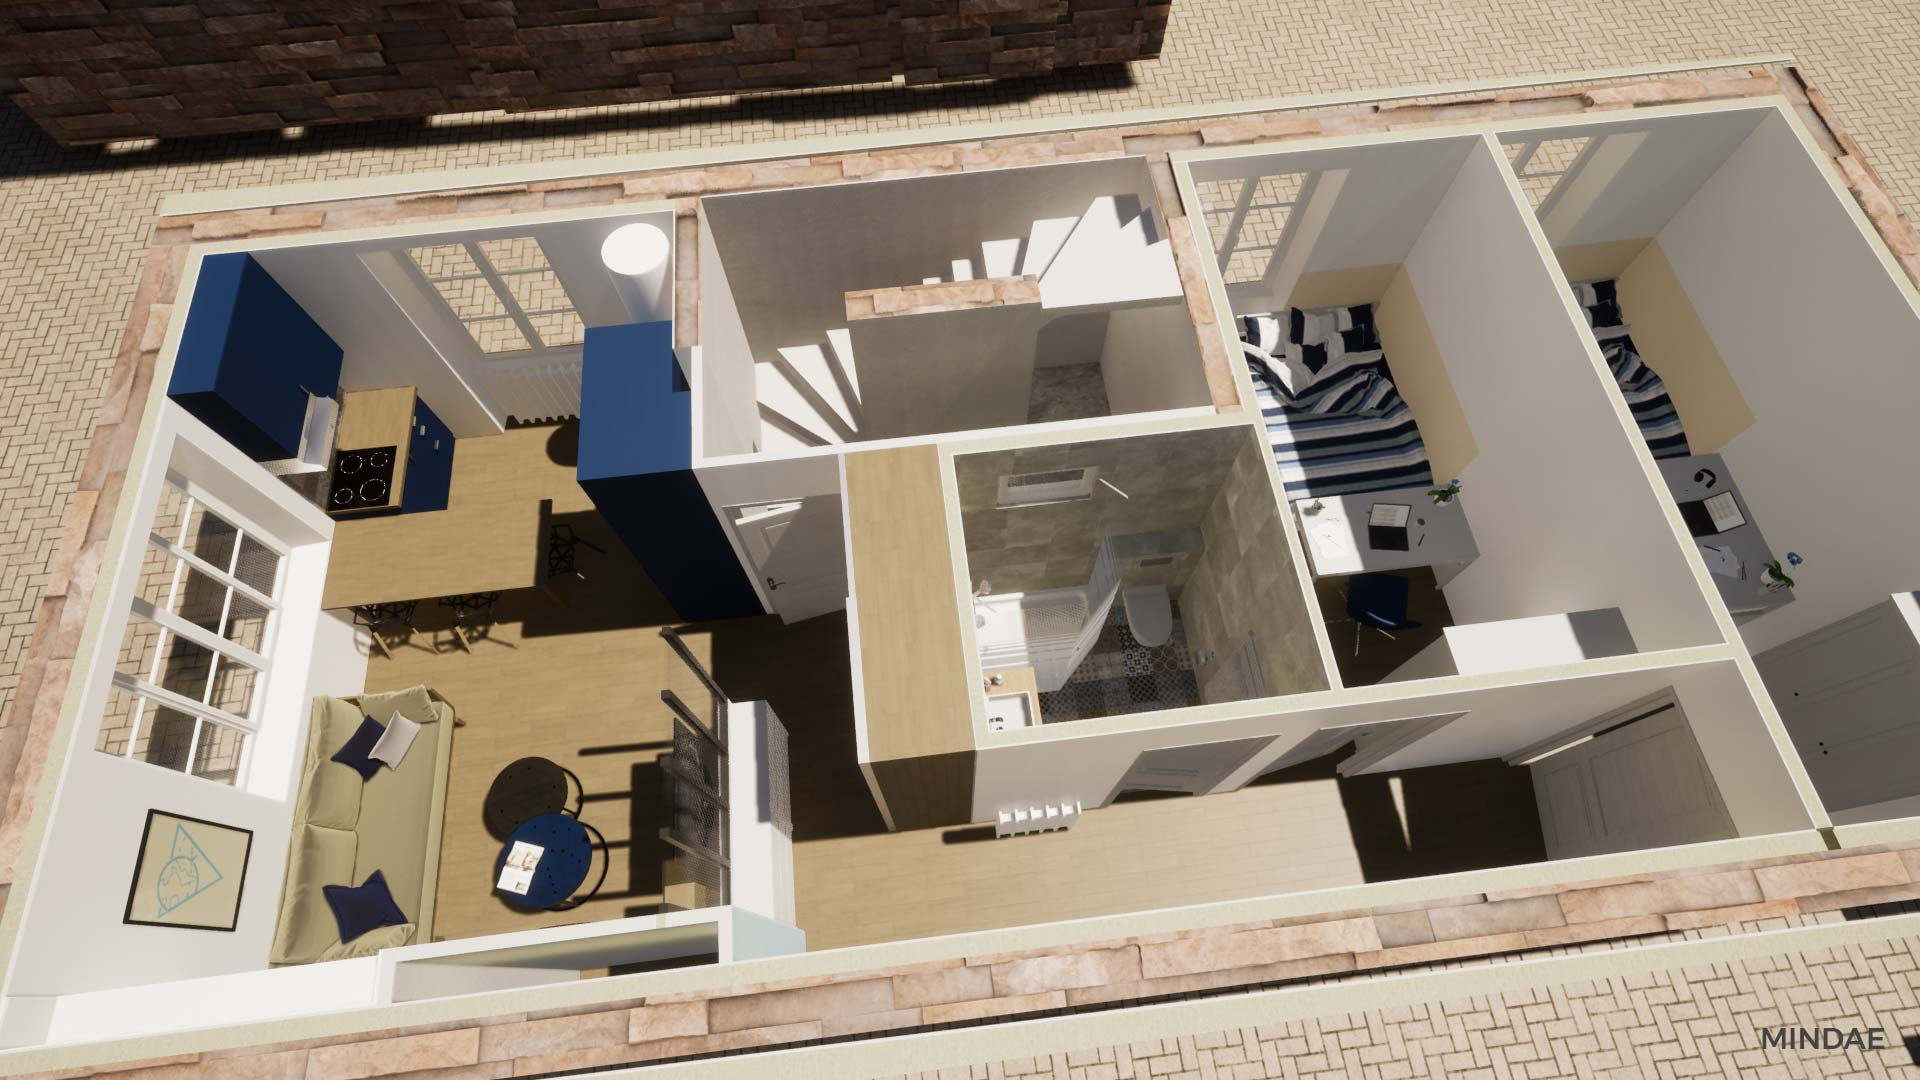 Mindae_3D_appartement_caen_saint_laurent_investisseur_colocation_airbnb_locatif_renovation_F2_F3-(1)